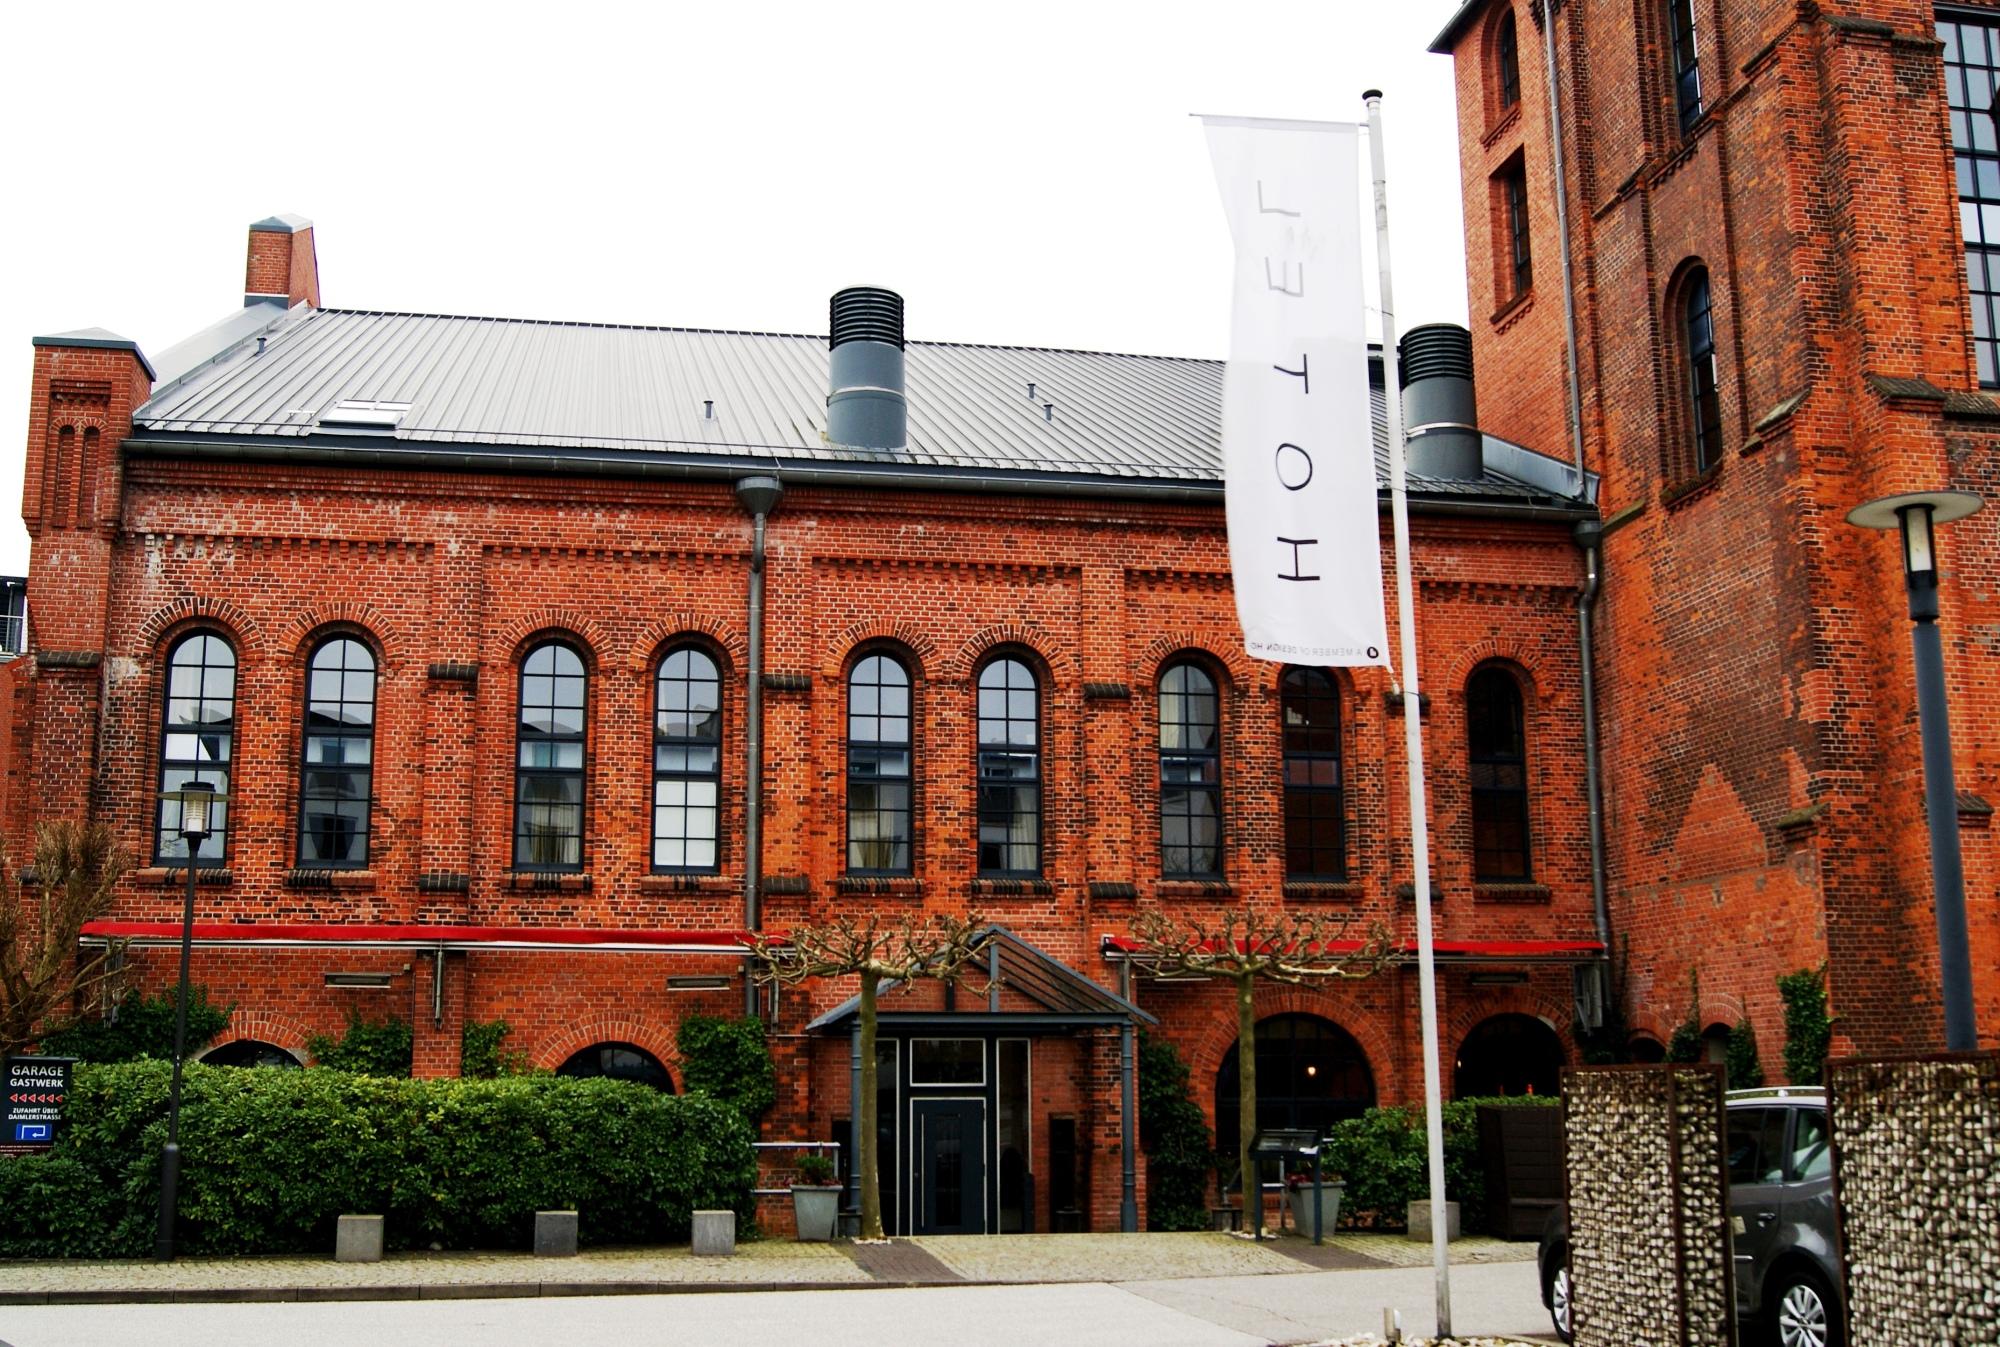 Gastwerk hotel Hamburg facade